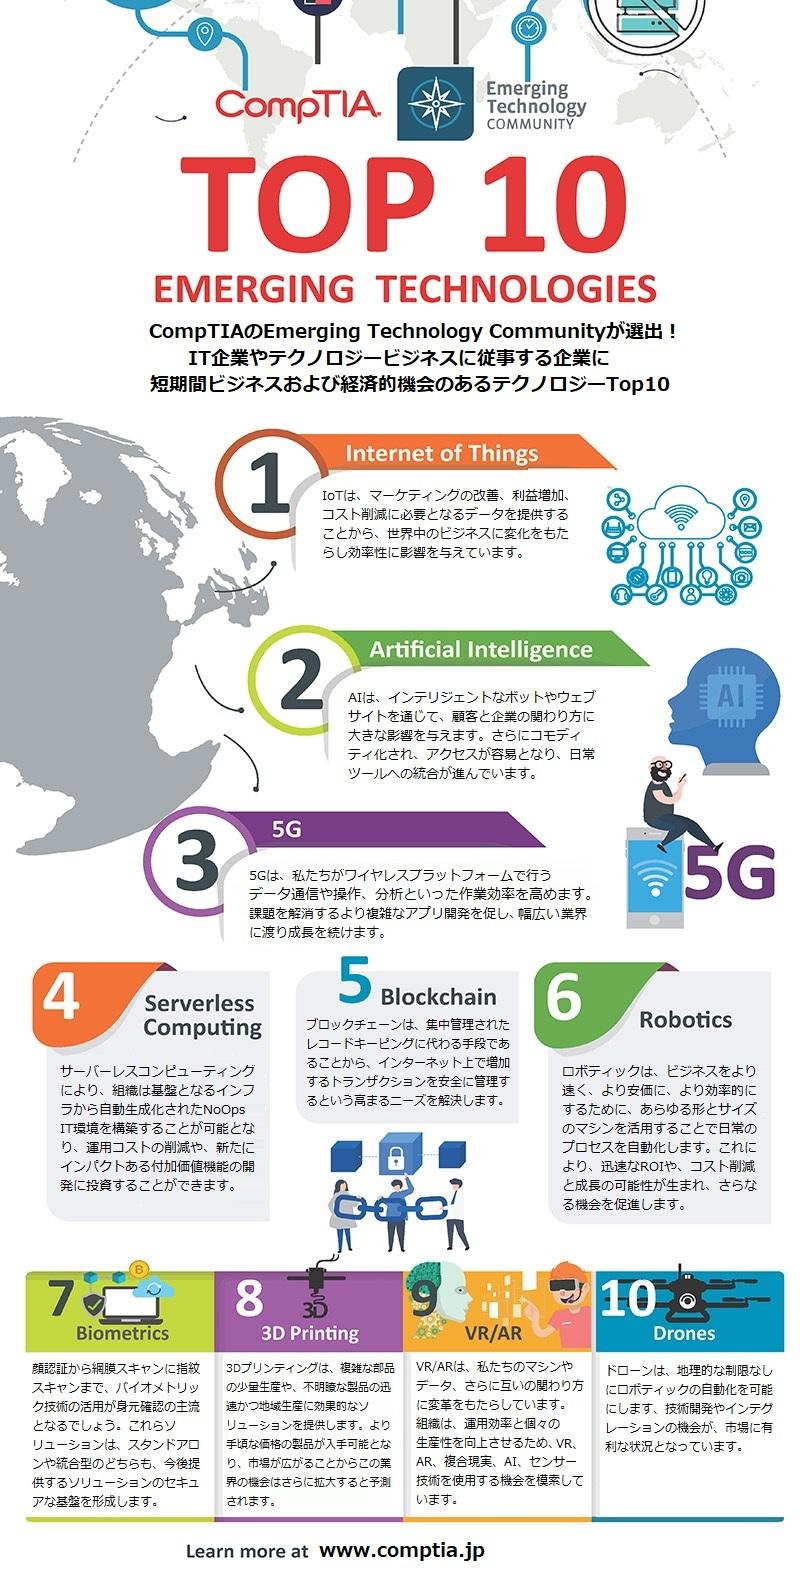 https://www.comptia.jp/information/images/emtech-top-10-emerging-technologies-2019_JP.jpg